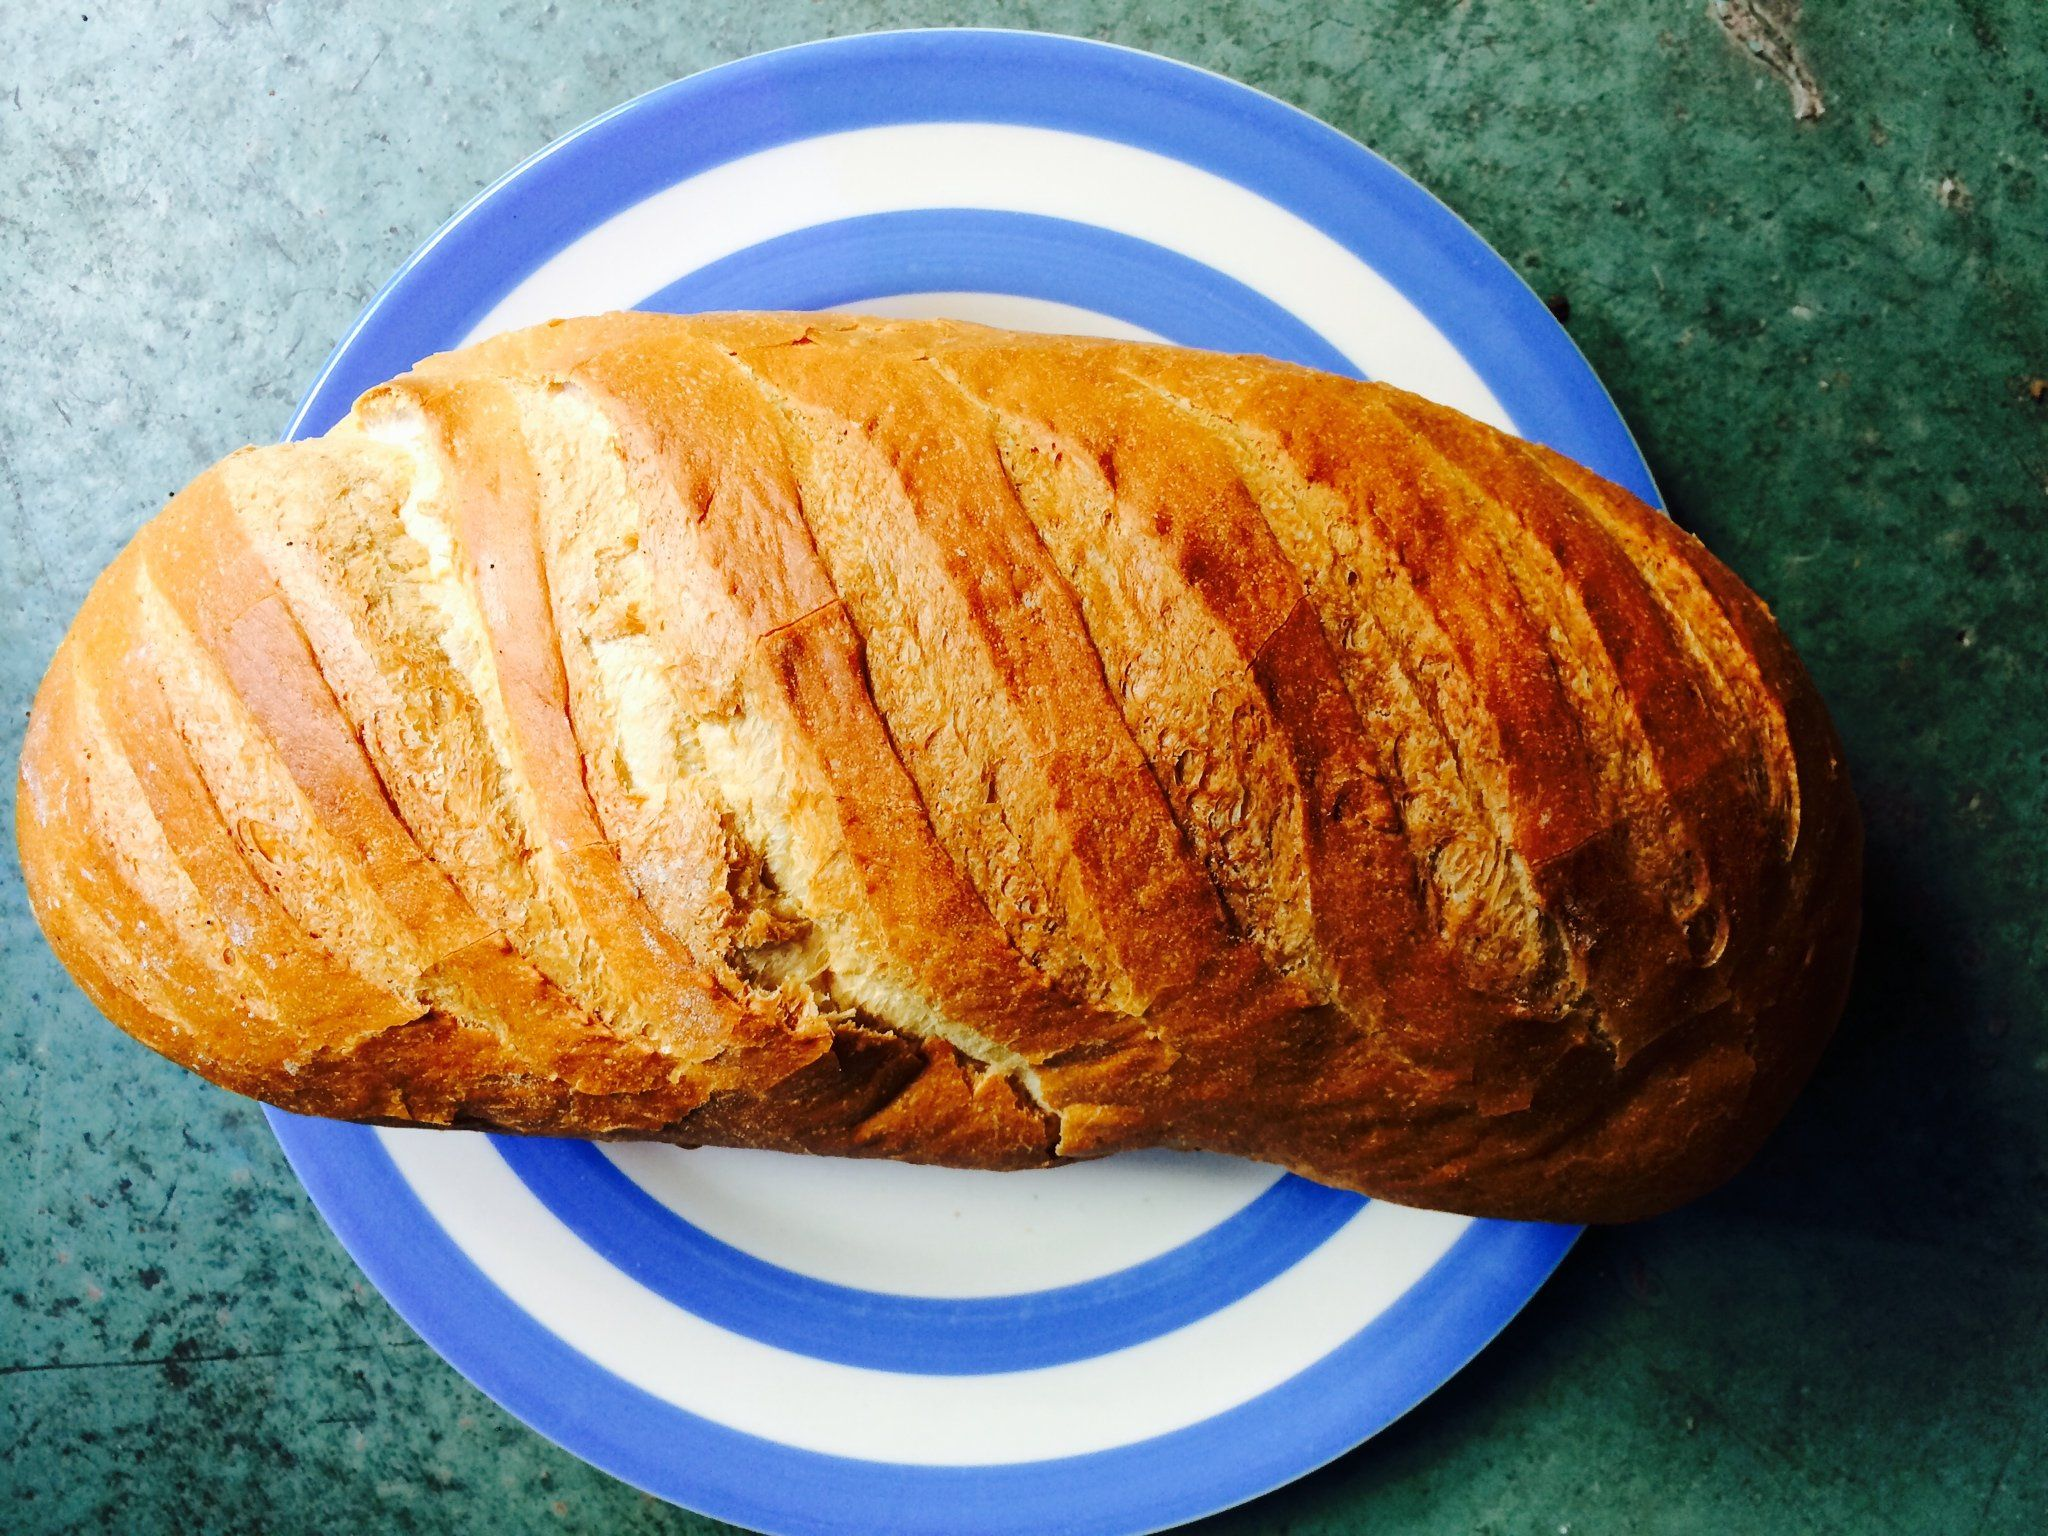 Berryman's Bread & Rolls